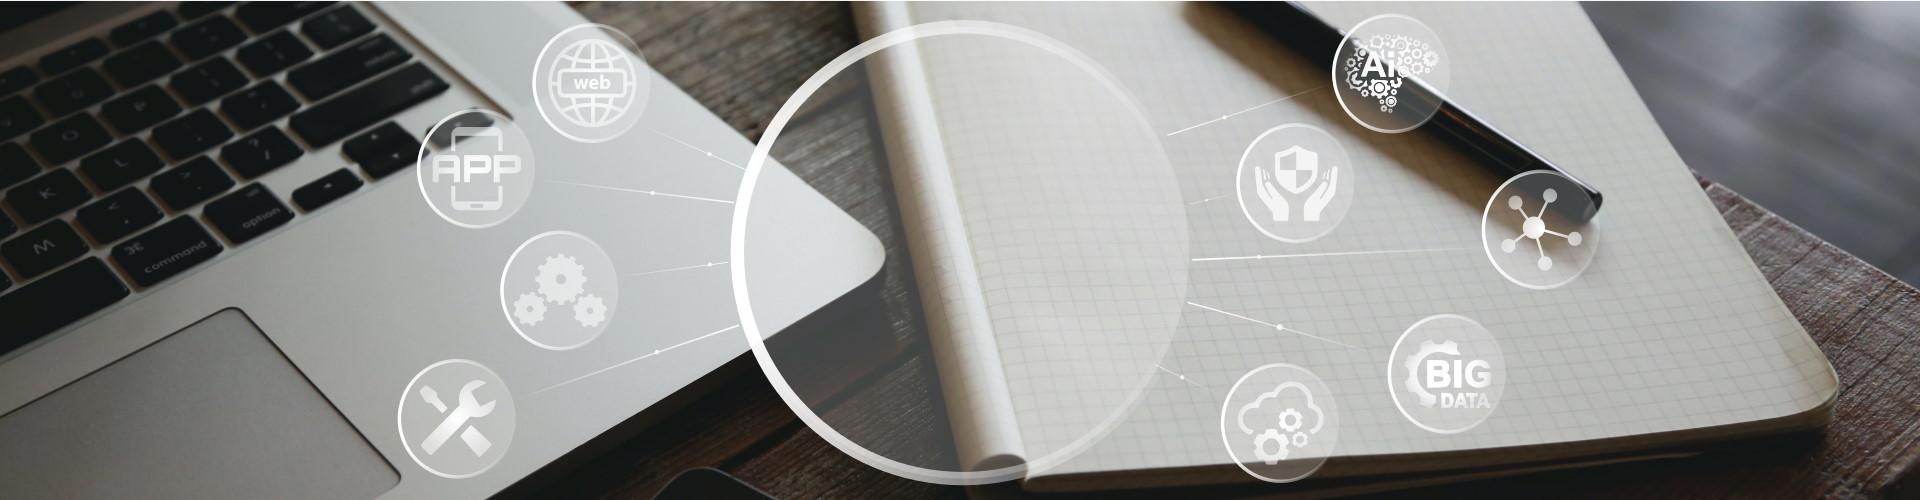 Phact blog banner